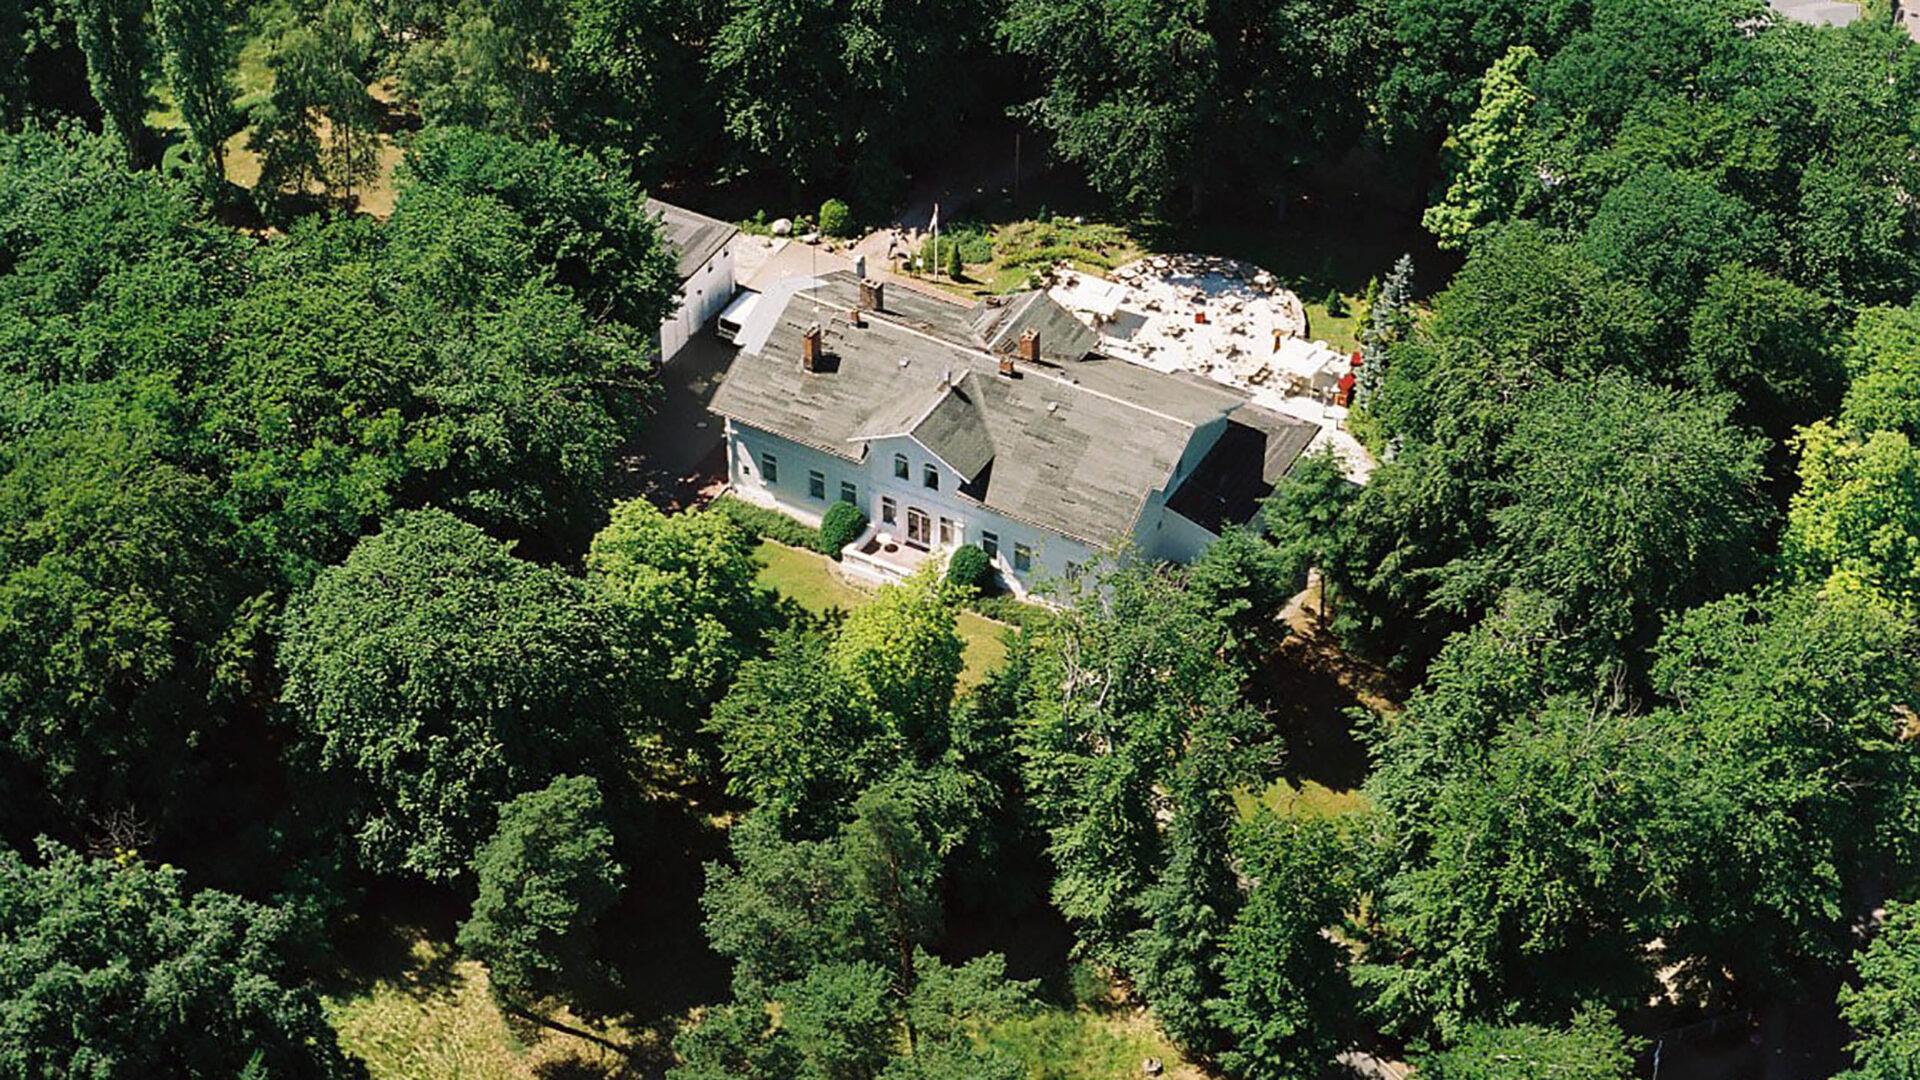 Hotel Weisses Schloss - Flugaufnahme